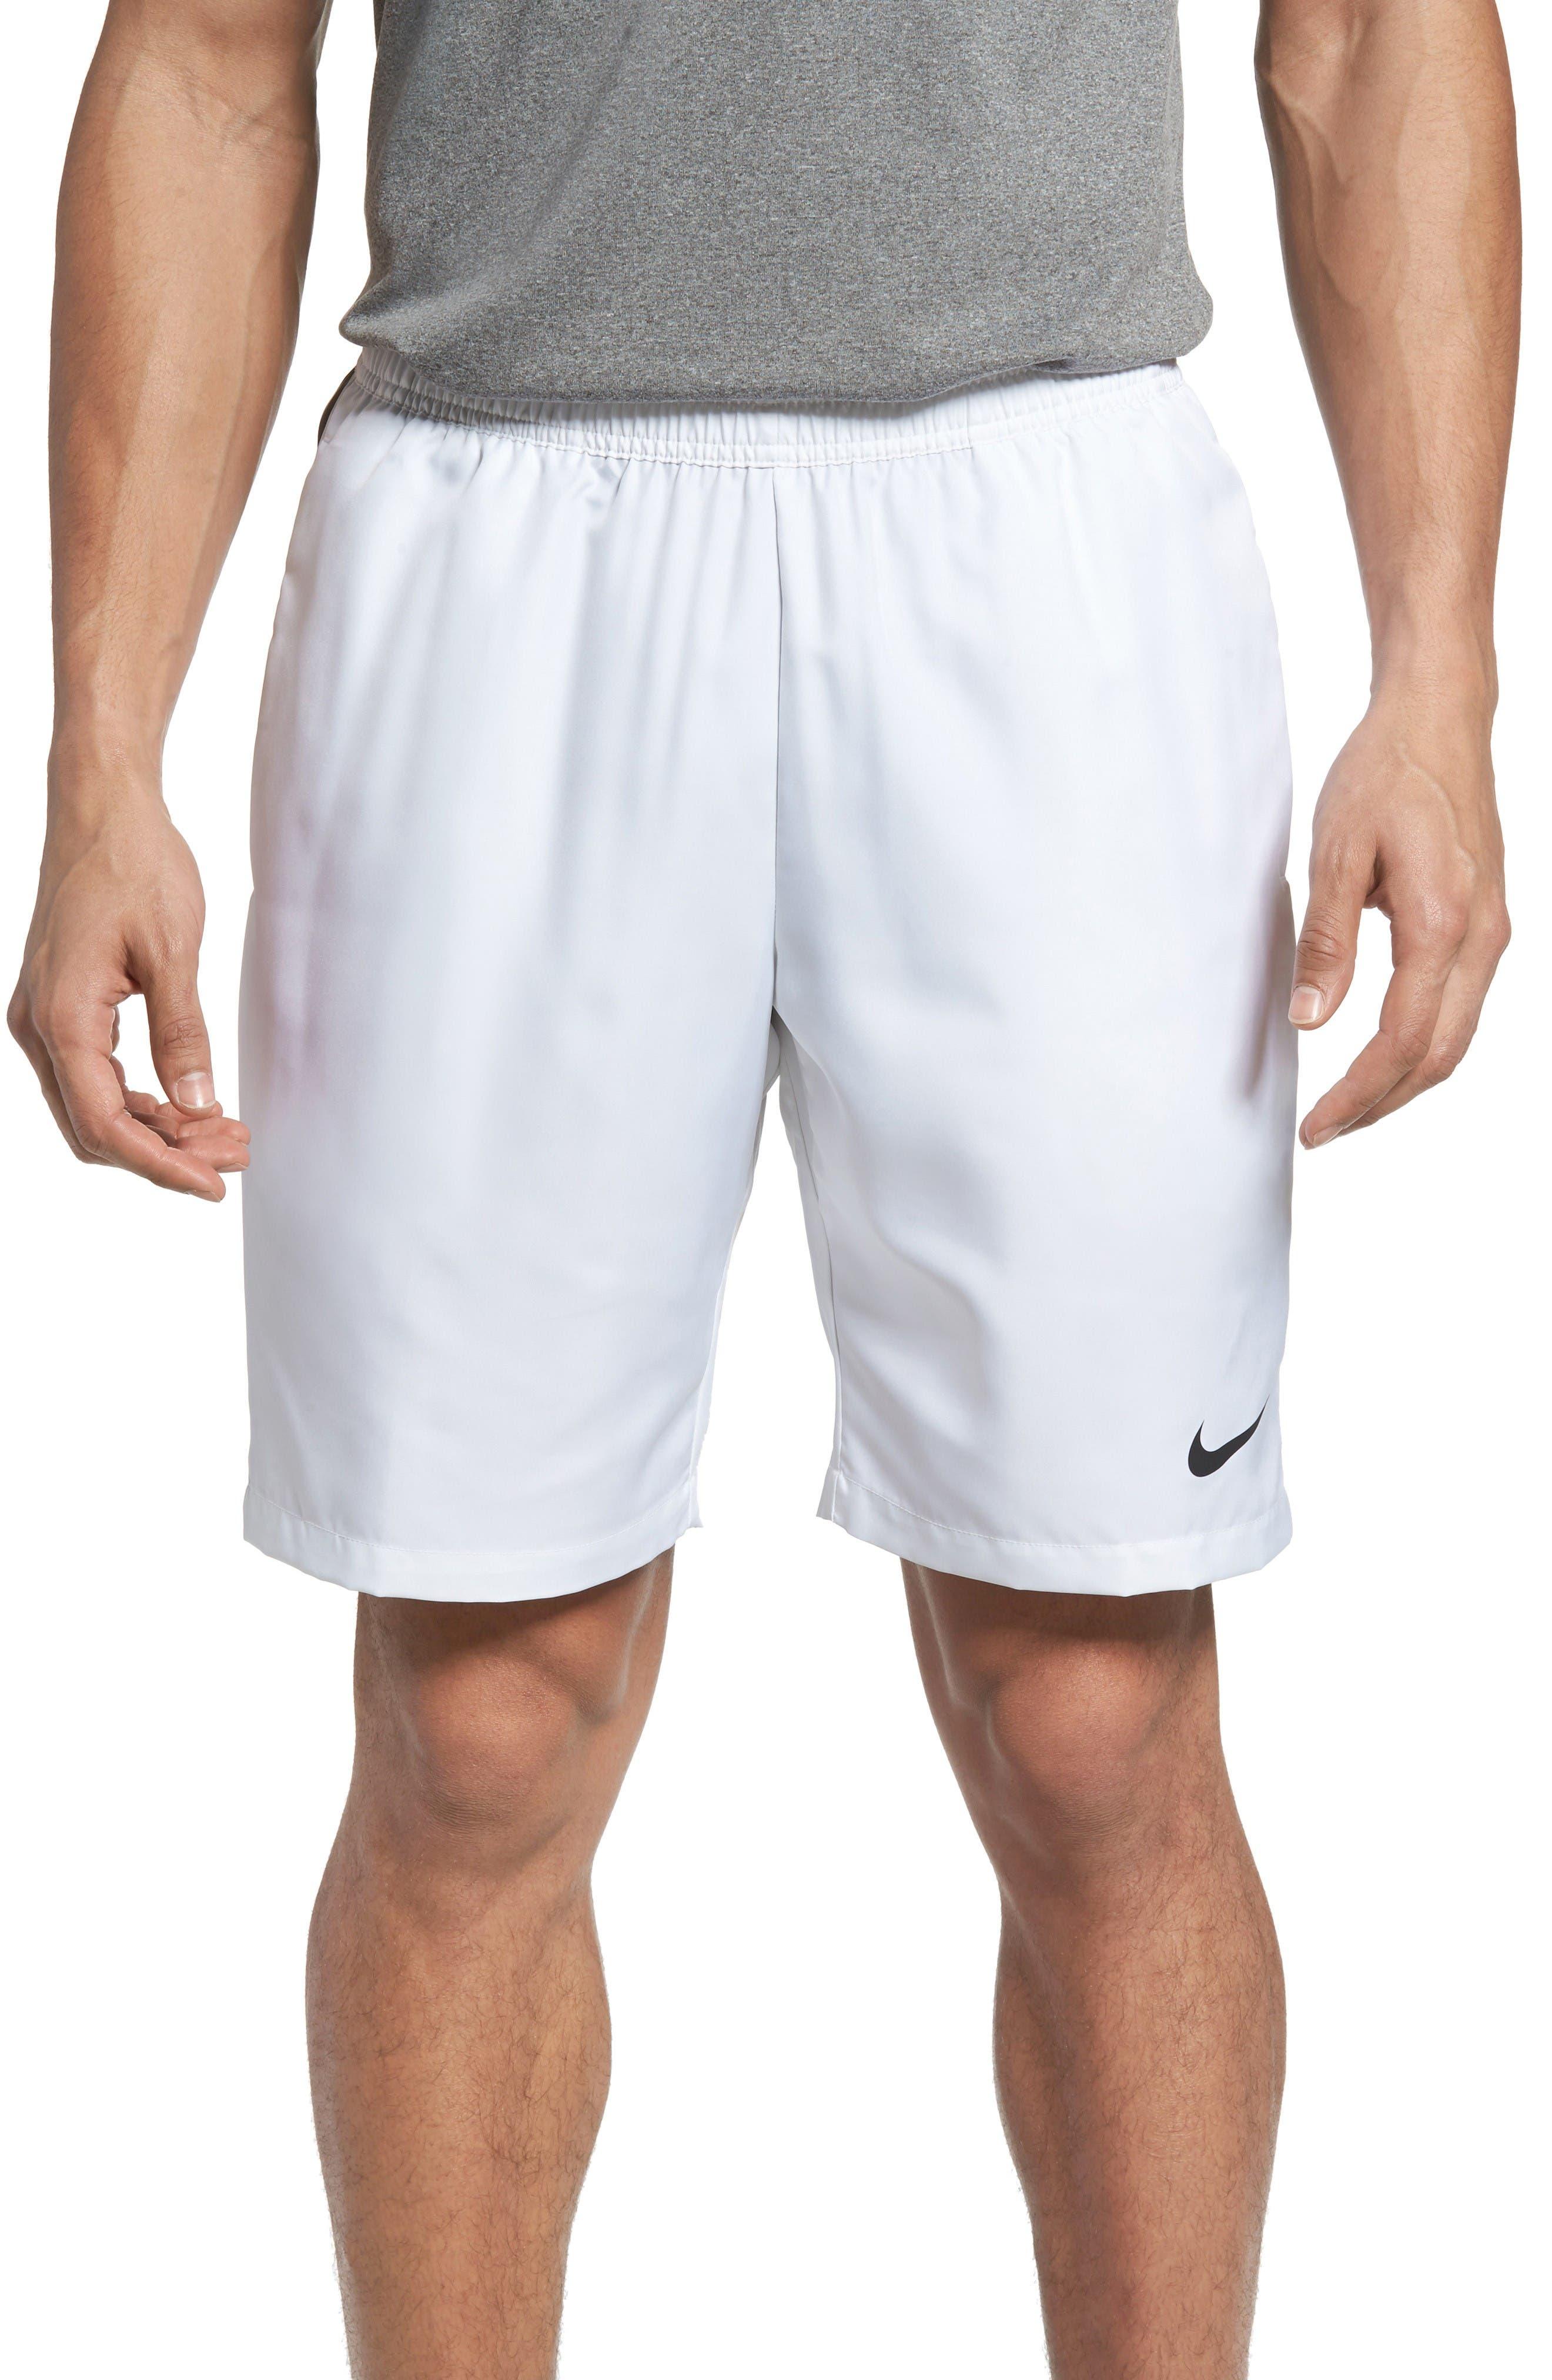 Alternate Image 1 Selected - Nike Tennis Shorts